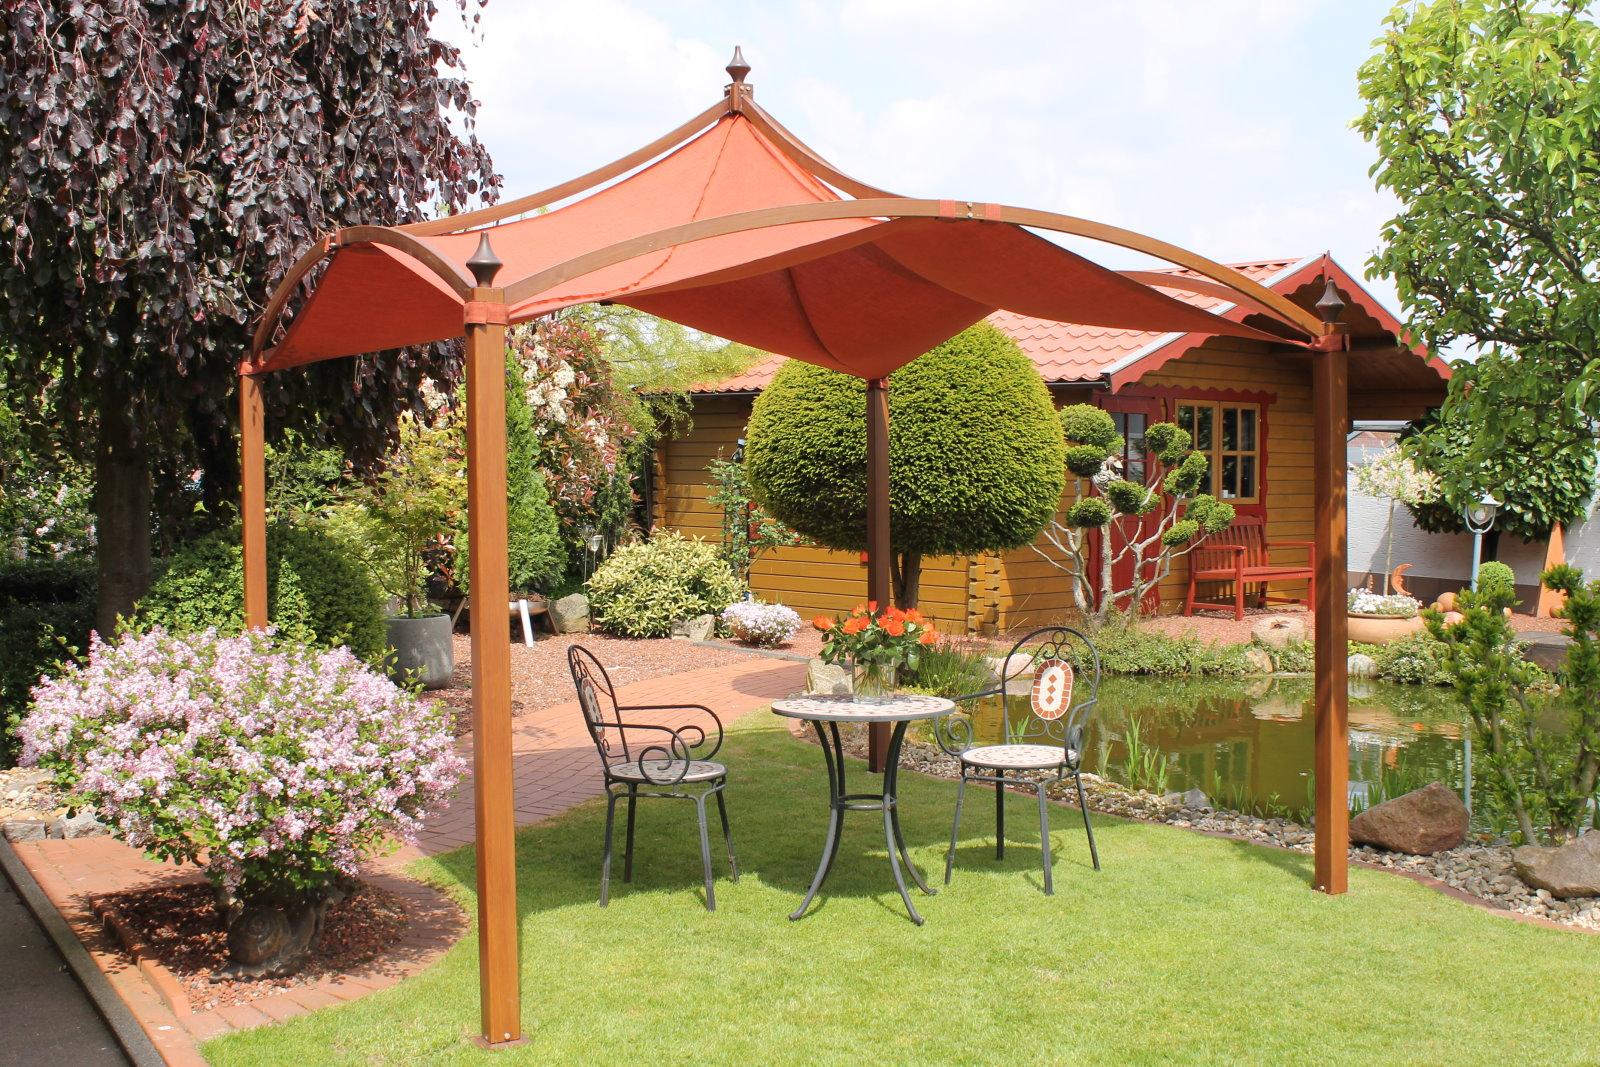 leco pavillon romantik 3x3m garten sonnenschutz zelt partyzelt holz optik ebay. Black Bedroom Furniture Sets. Home Design Ideas